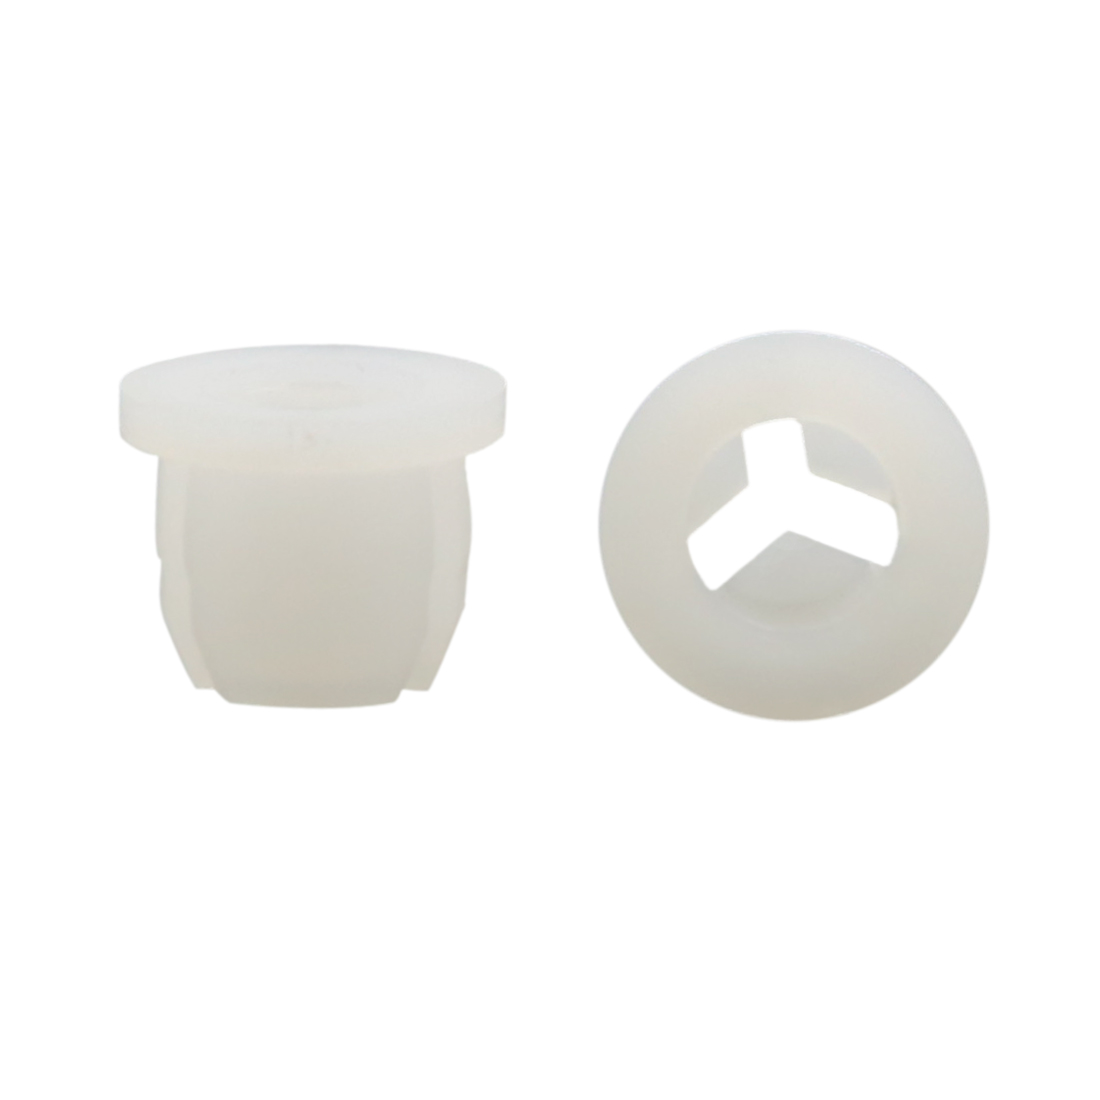 50Pcs White Plastic Rivets Fastener Fender Bumper Push Clips 10mm for Car